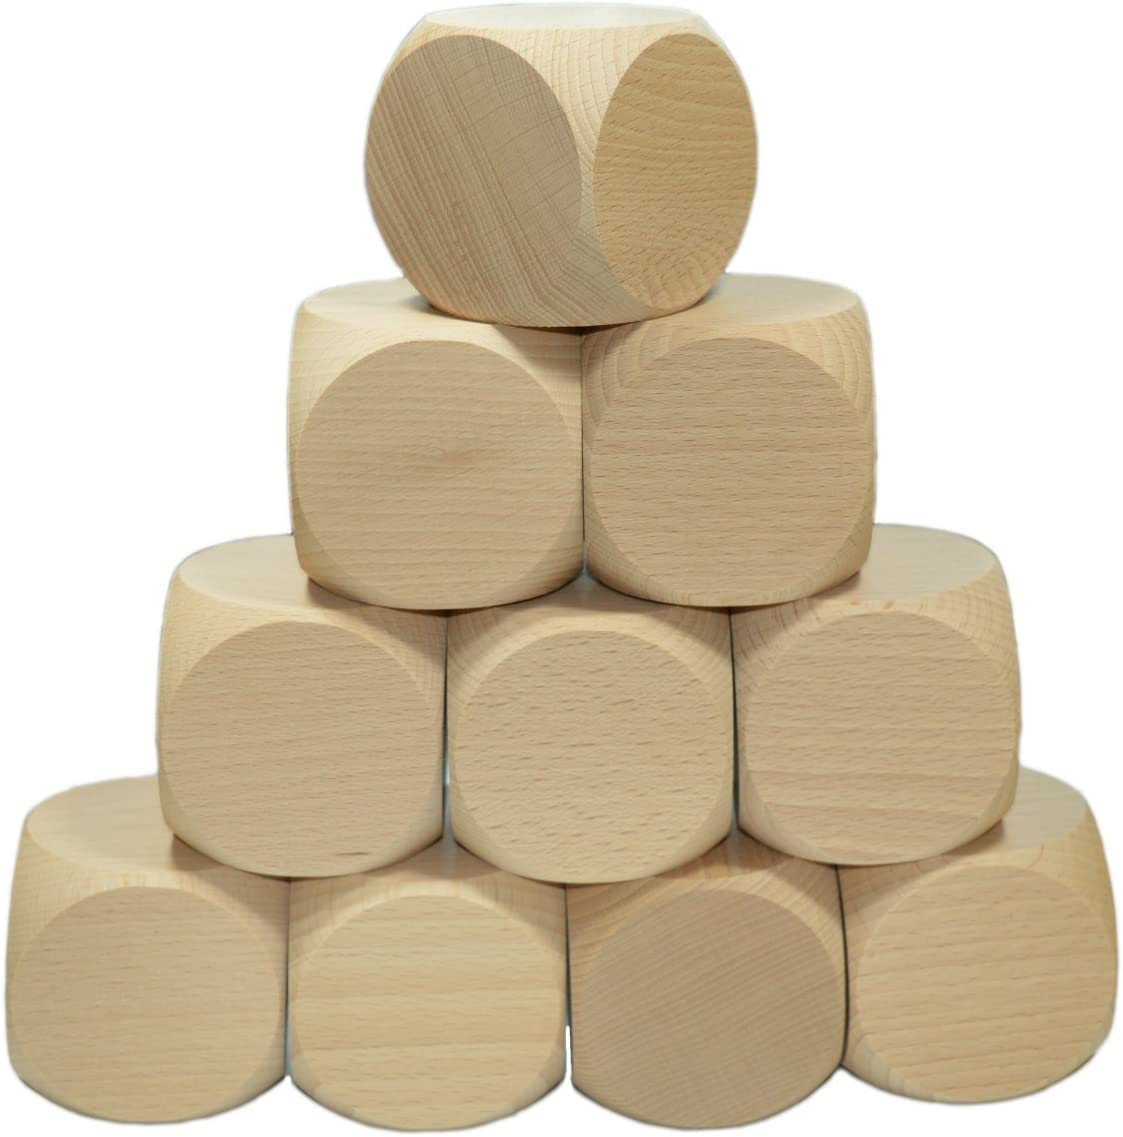 Gebetswürfel 3 x Gico Blankowürfel Holzwürfel natur mit 40 mm Kantenlänge t